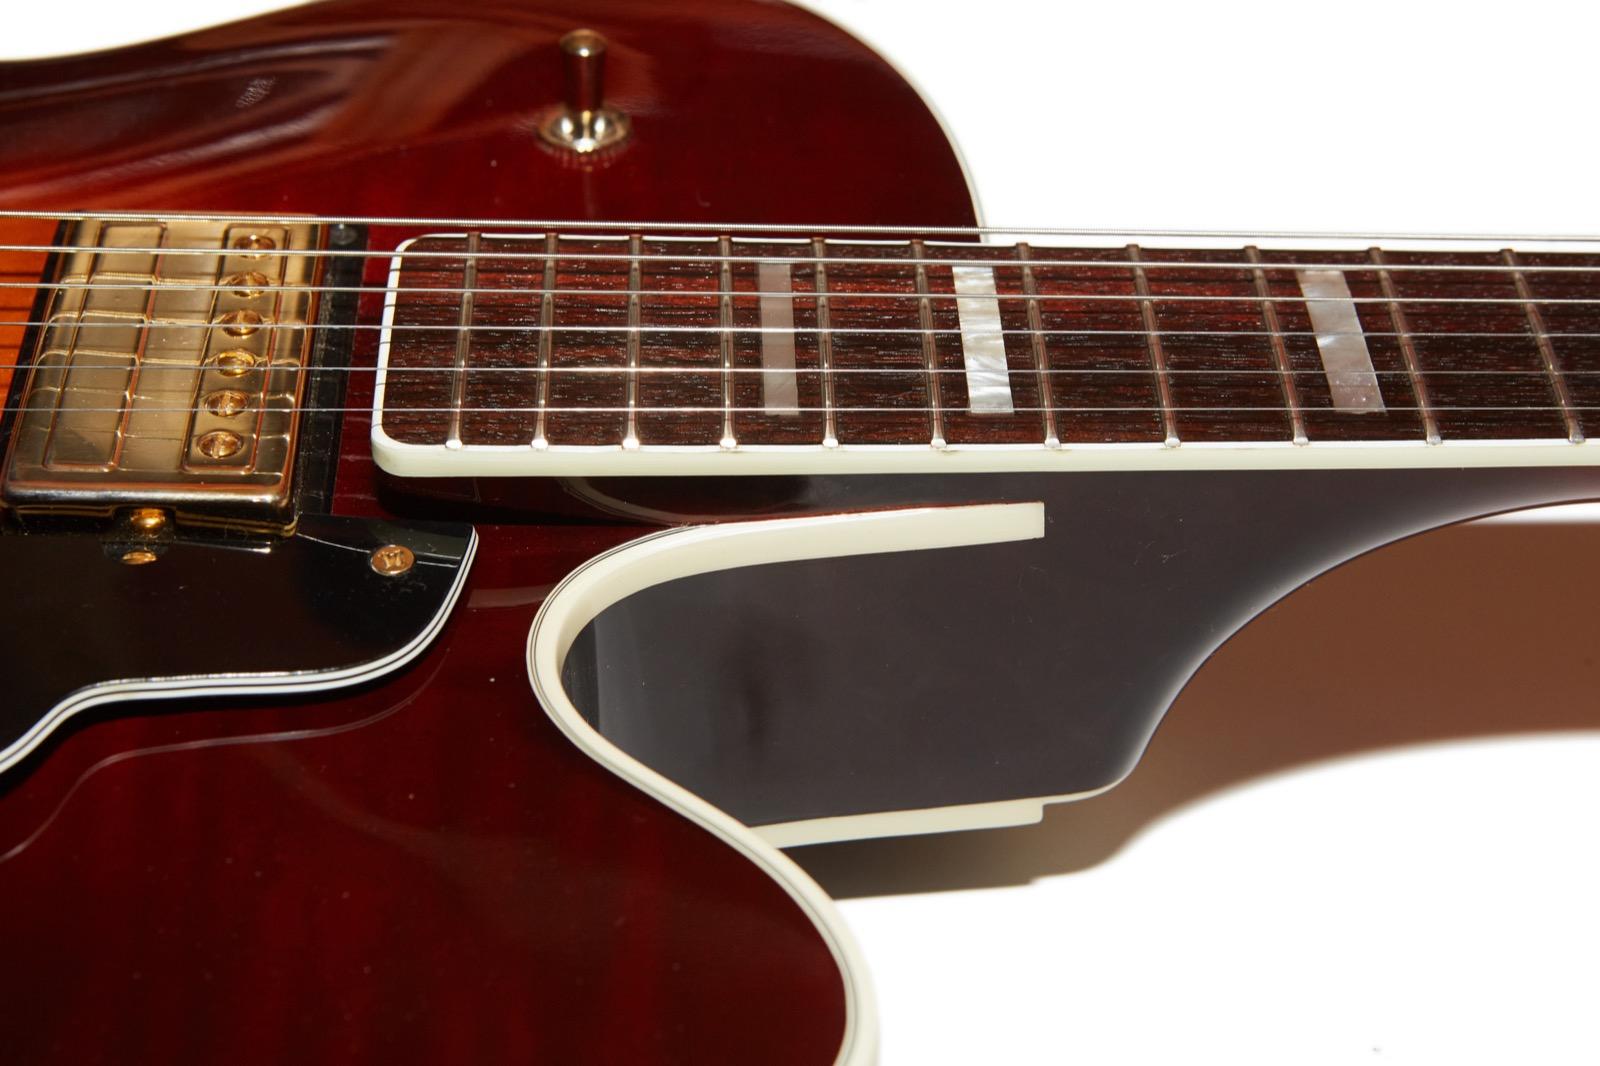 Hookup guild guitars by serial number